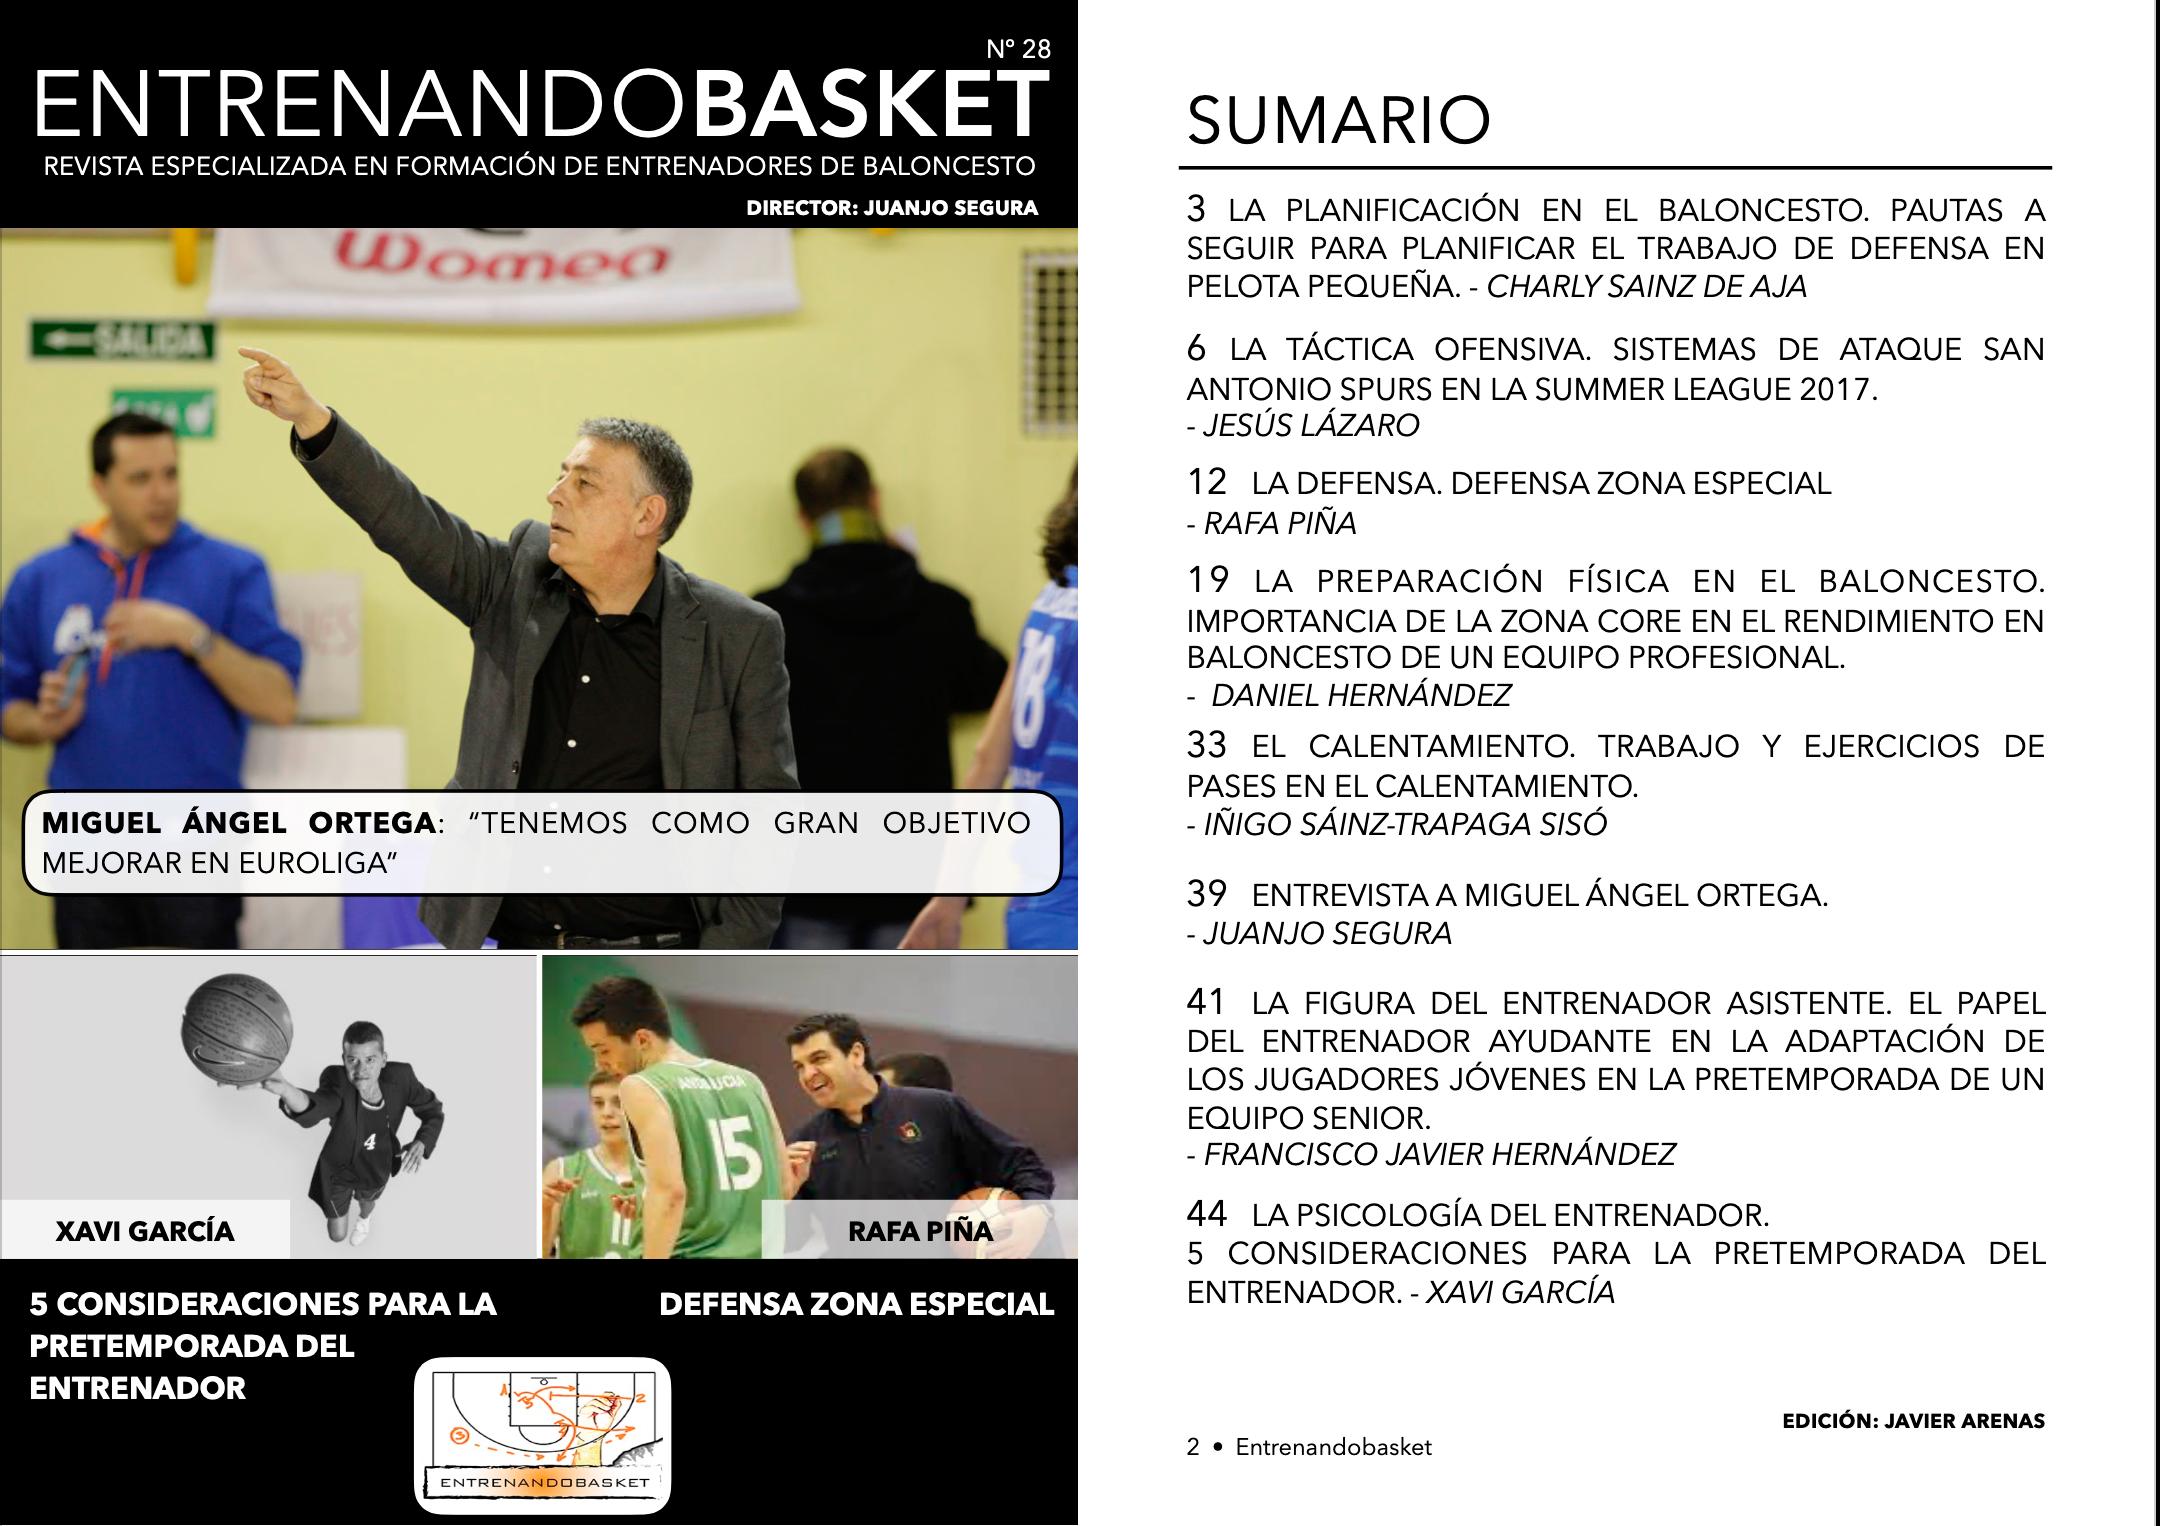 Entrenandobasket_28